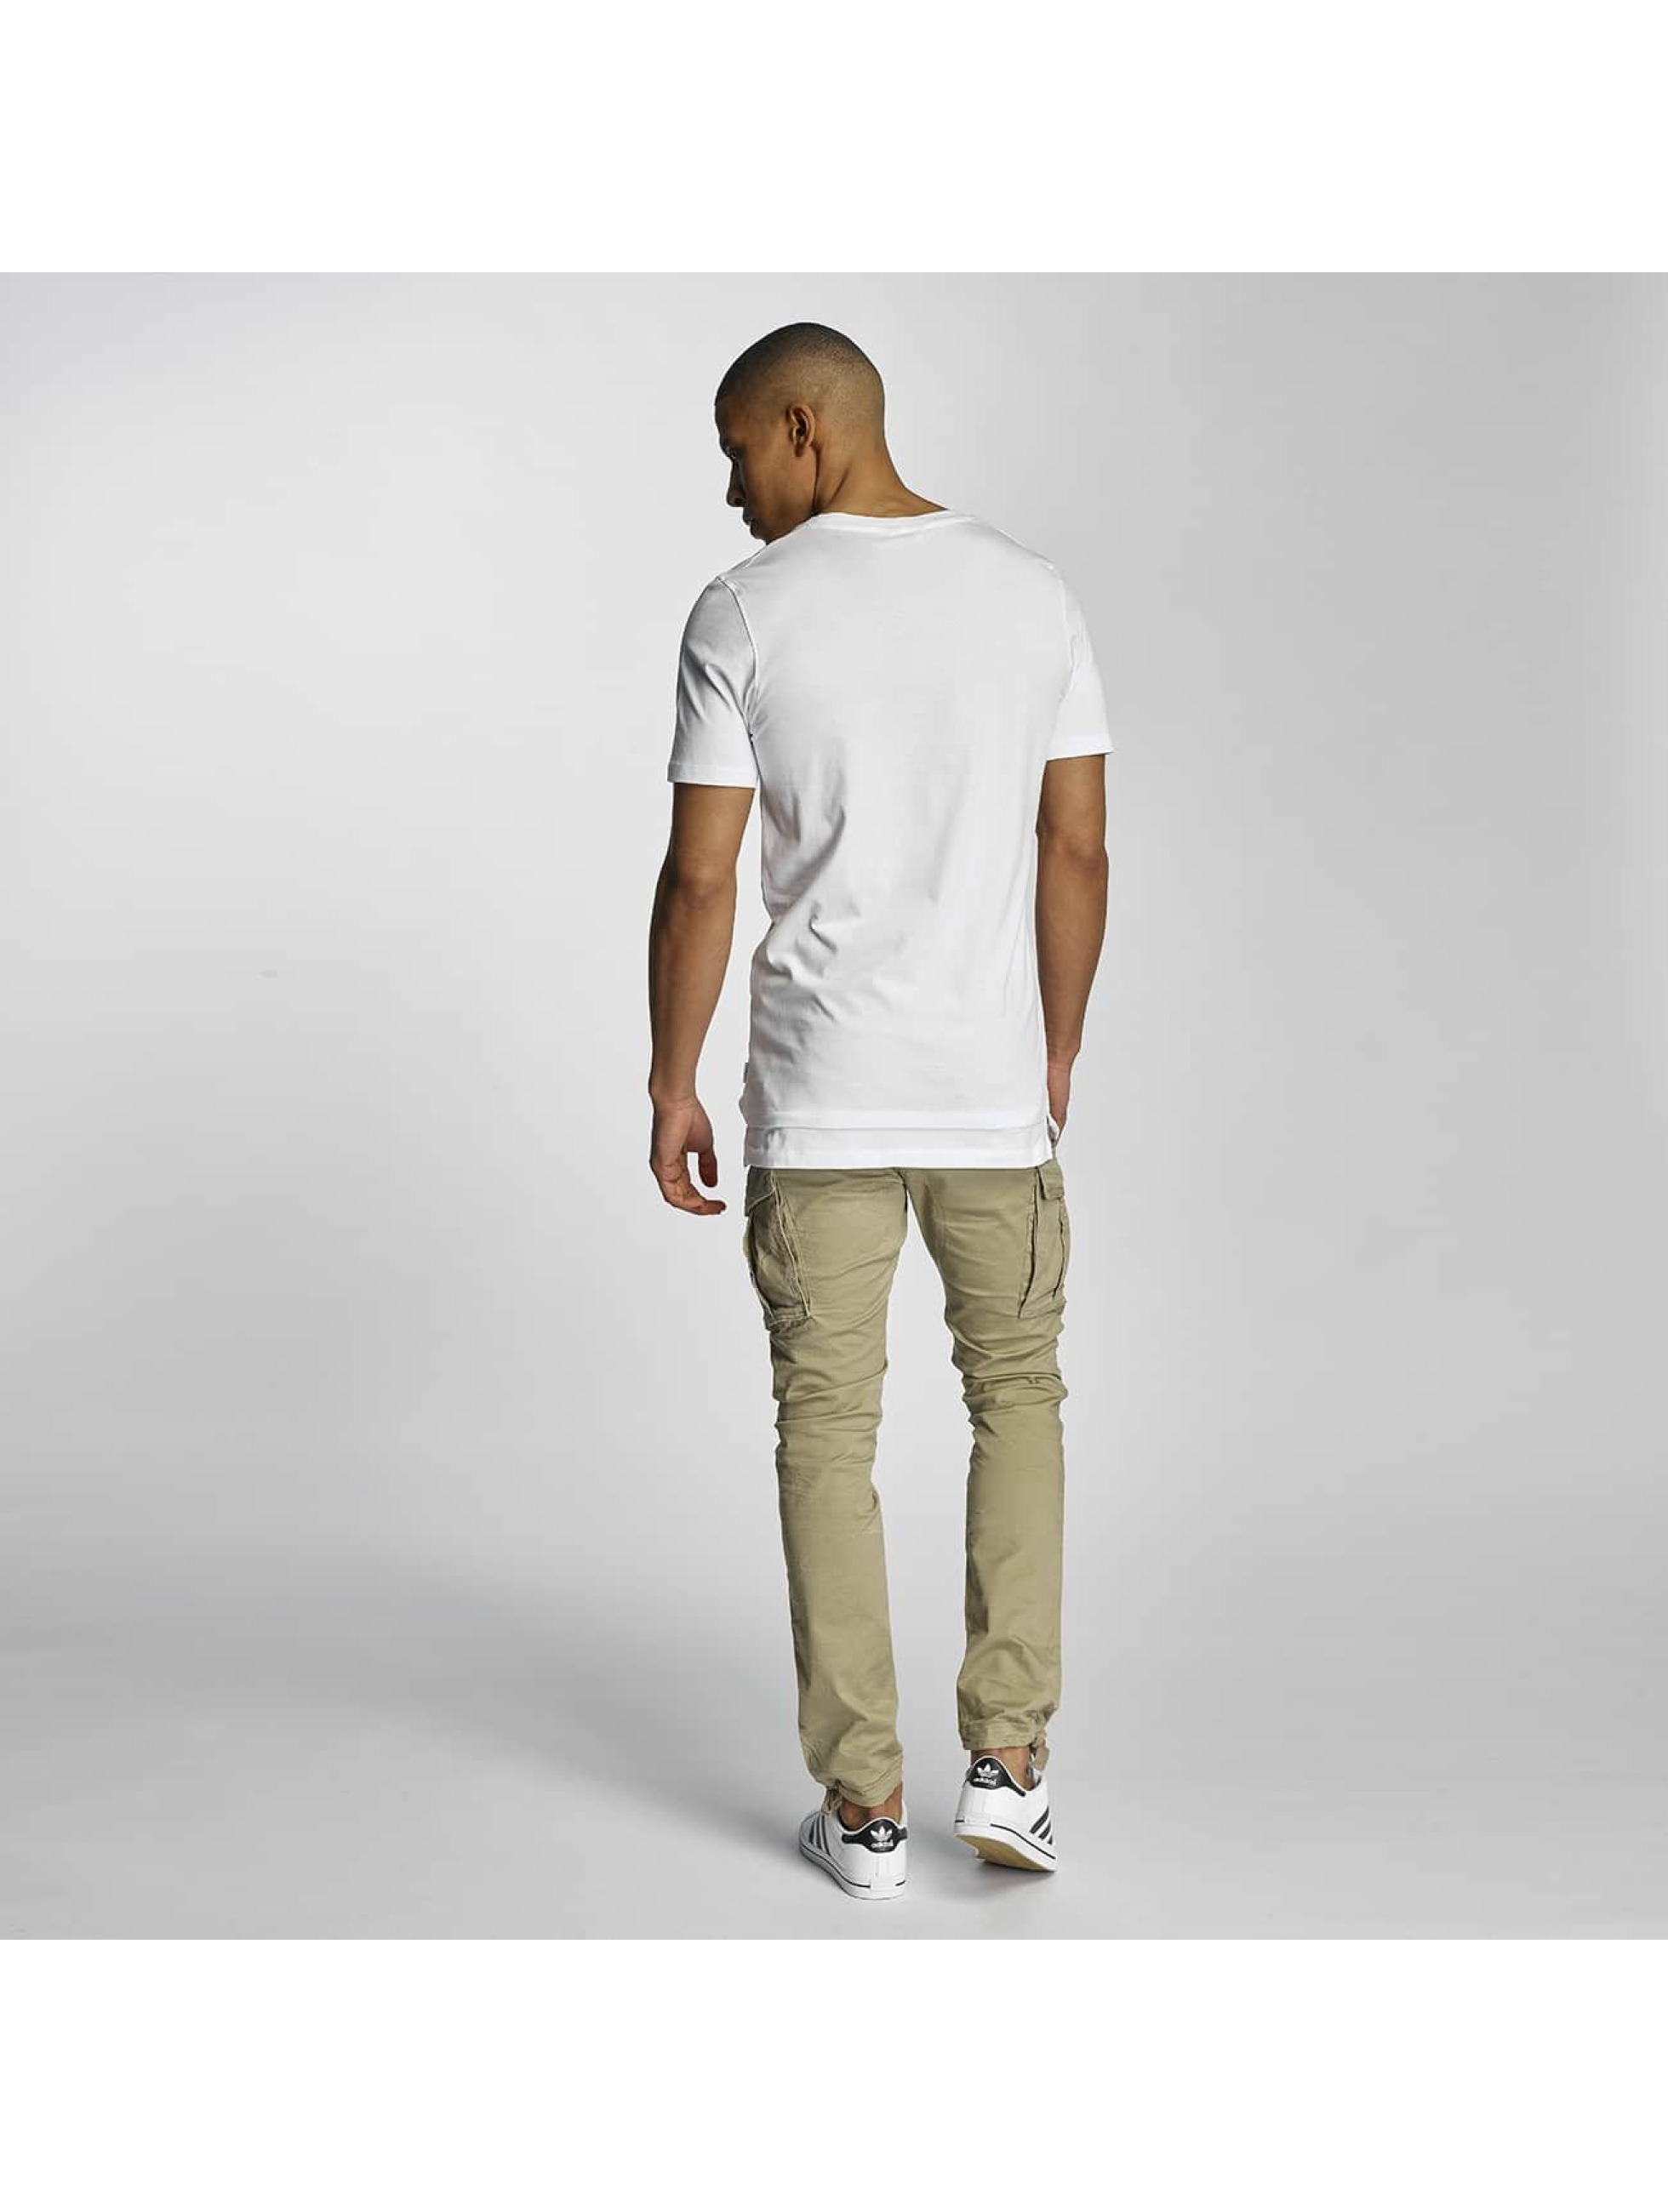 Jack & Jones T-Shirt jcoJazz white